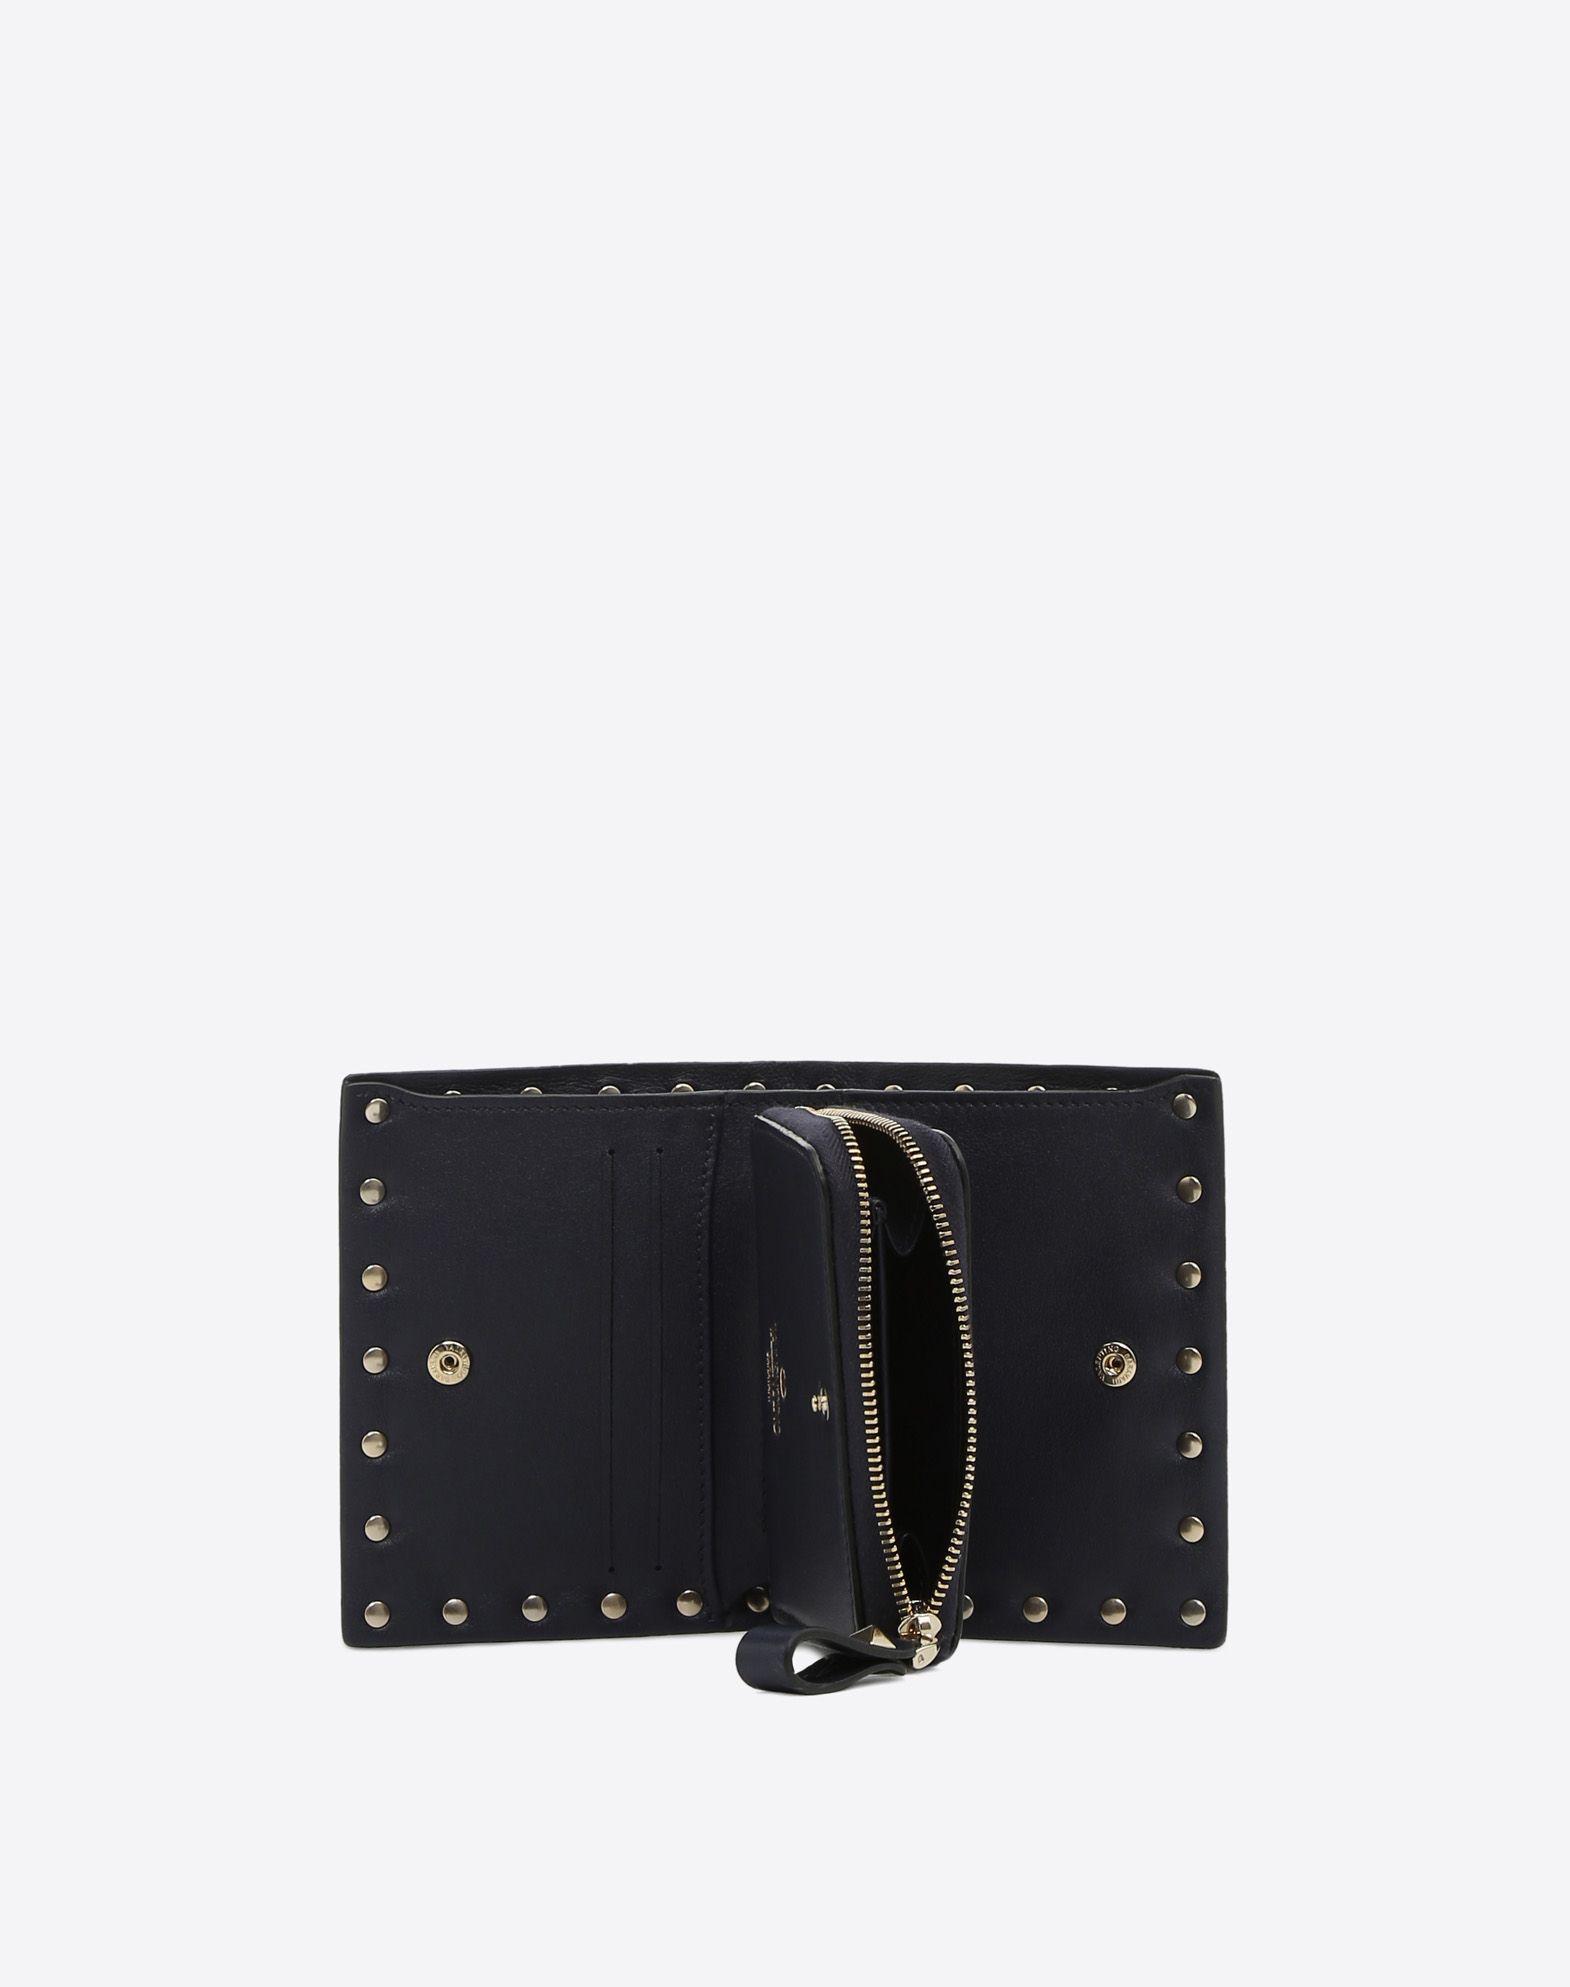 VALENTINO GARAVANI Compact Rockstud Wallet COMPACT WALLETS D a